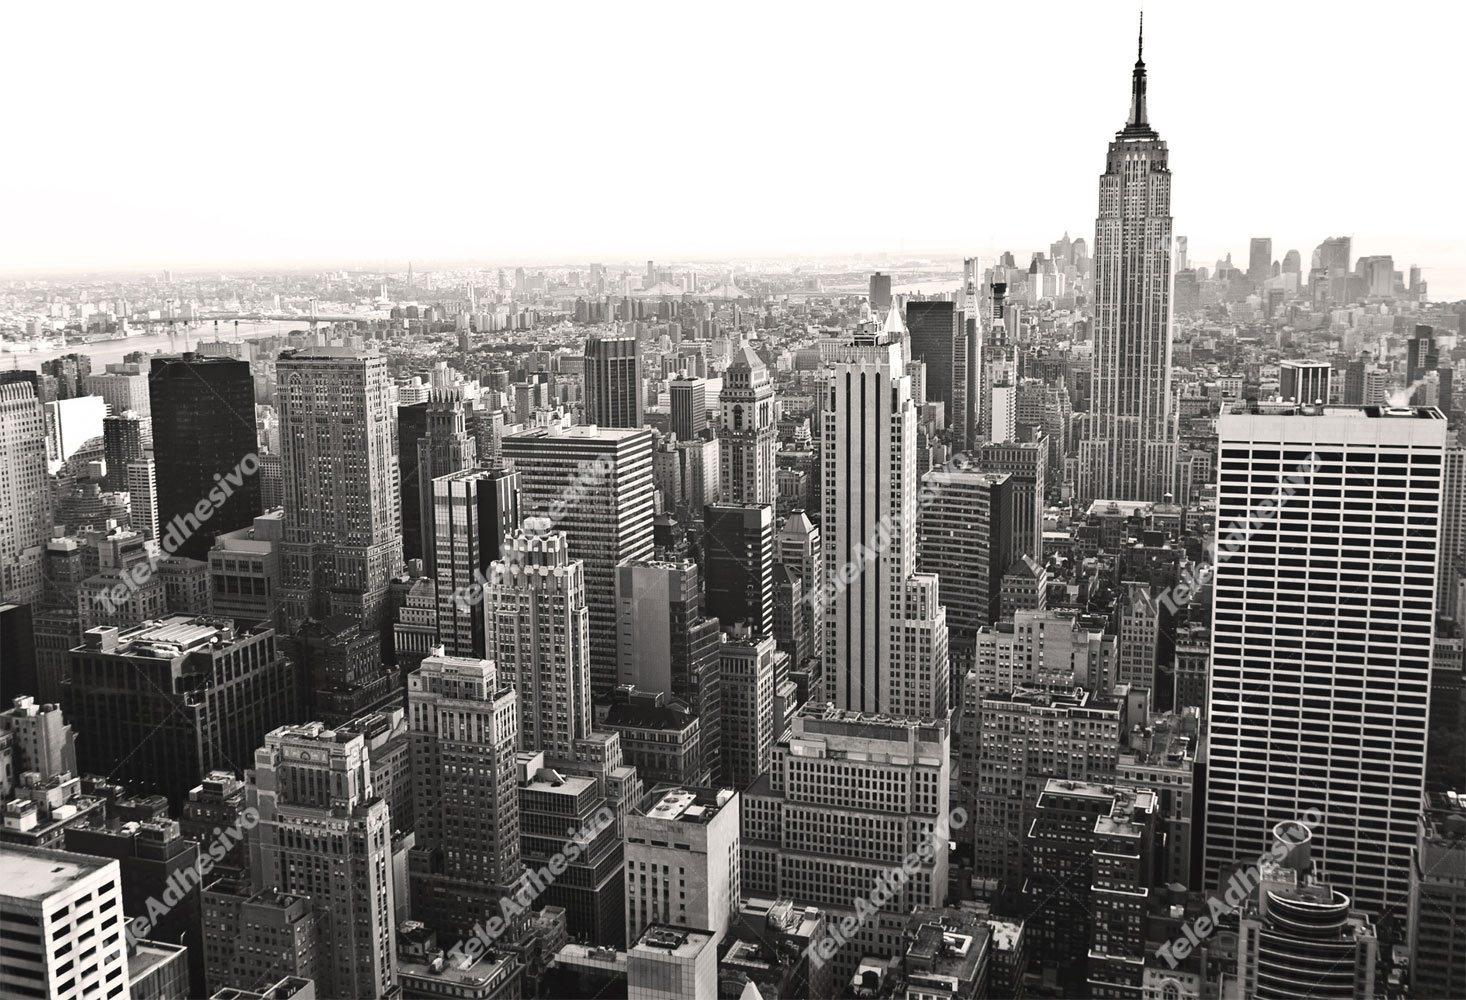 Fototapeten: Aerial view of New York